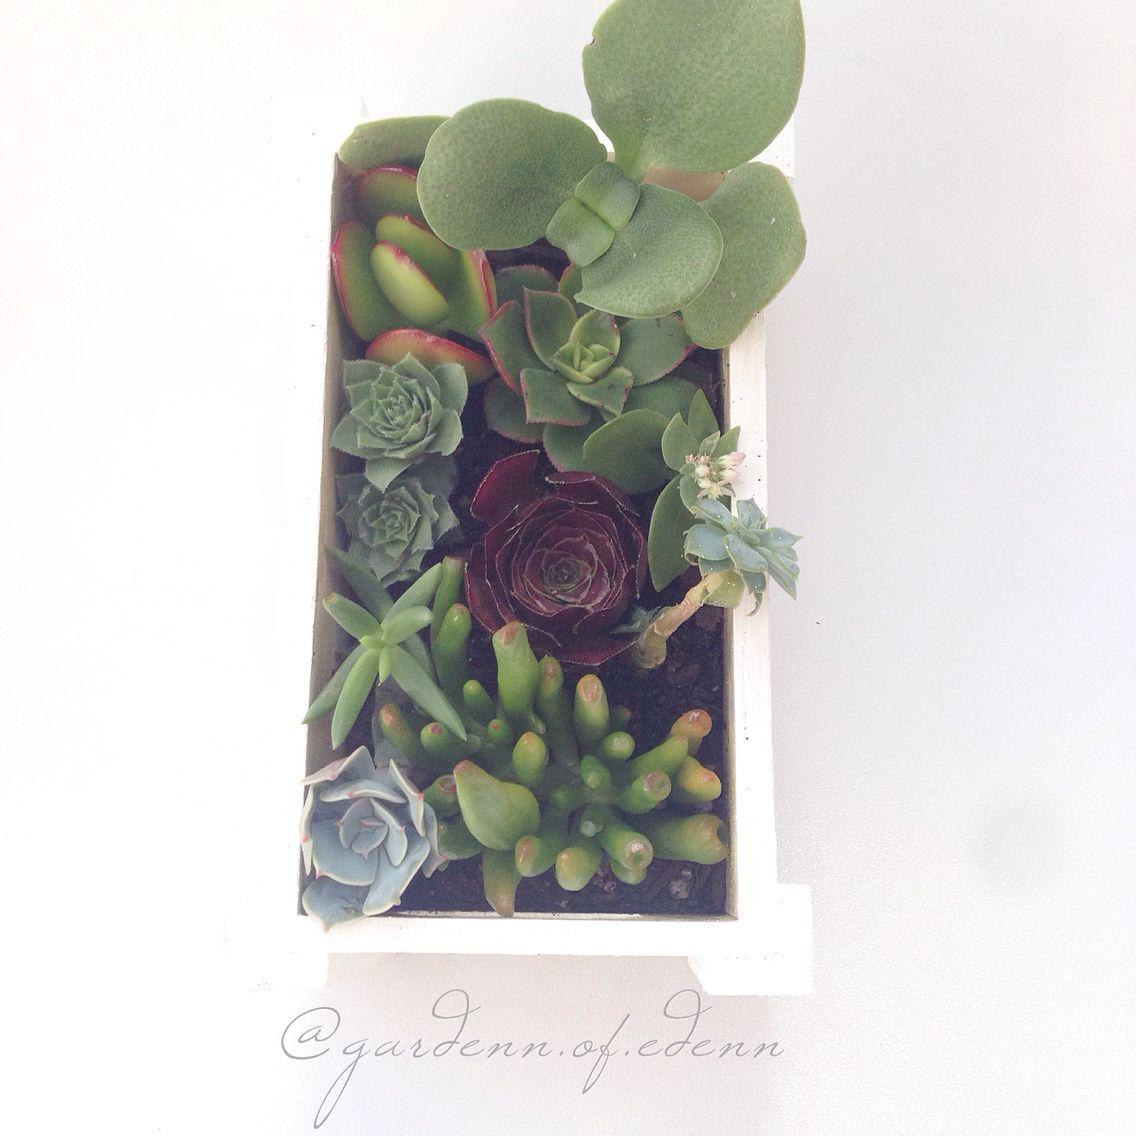 My own little secret garden!  #succulents #succs #succulentlove #plants #garden #gardennofedenn #melbourne #handmade #homemade #unique #cactus #cute #pretty #individual #weloveplants #succulentlove #hanging #cord